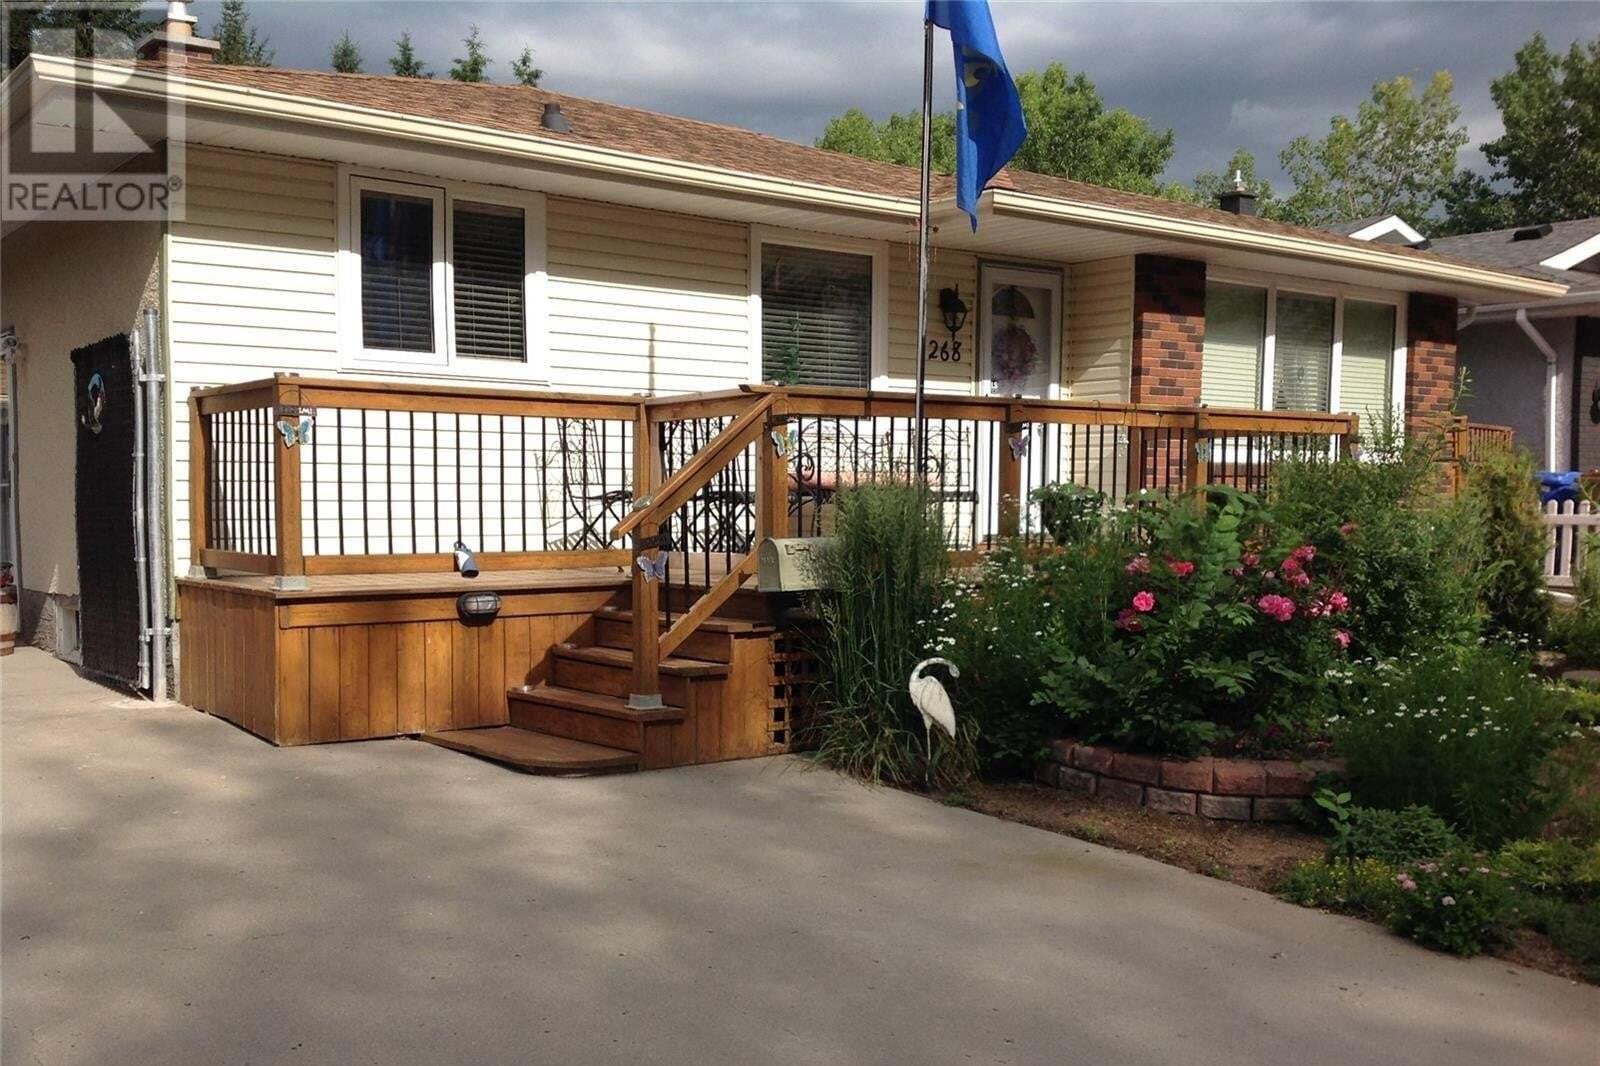 House for sale at 268 Wells St Regina Saskatchewan - MLS: SK814785